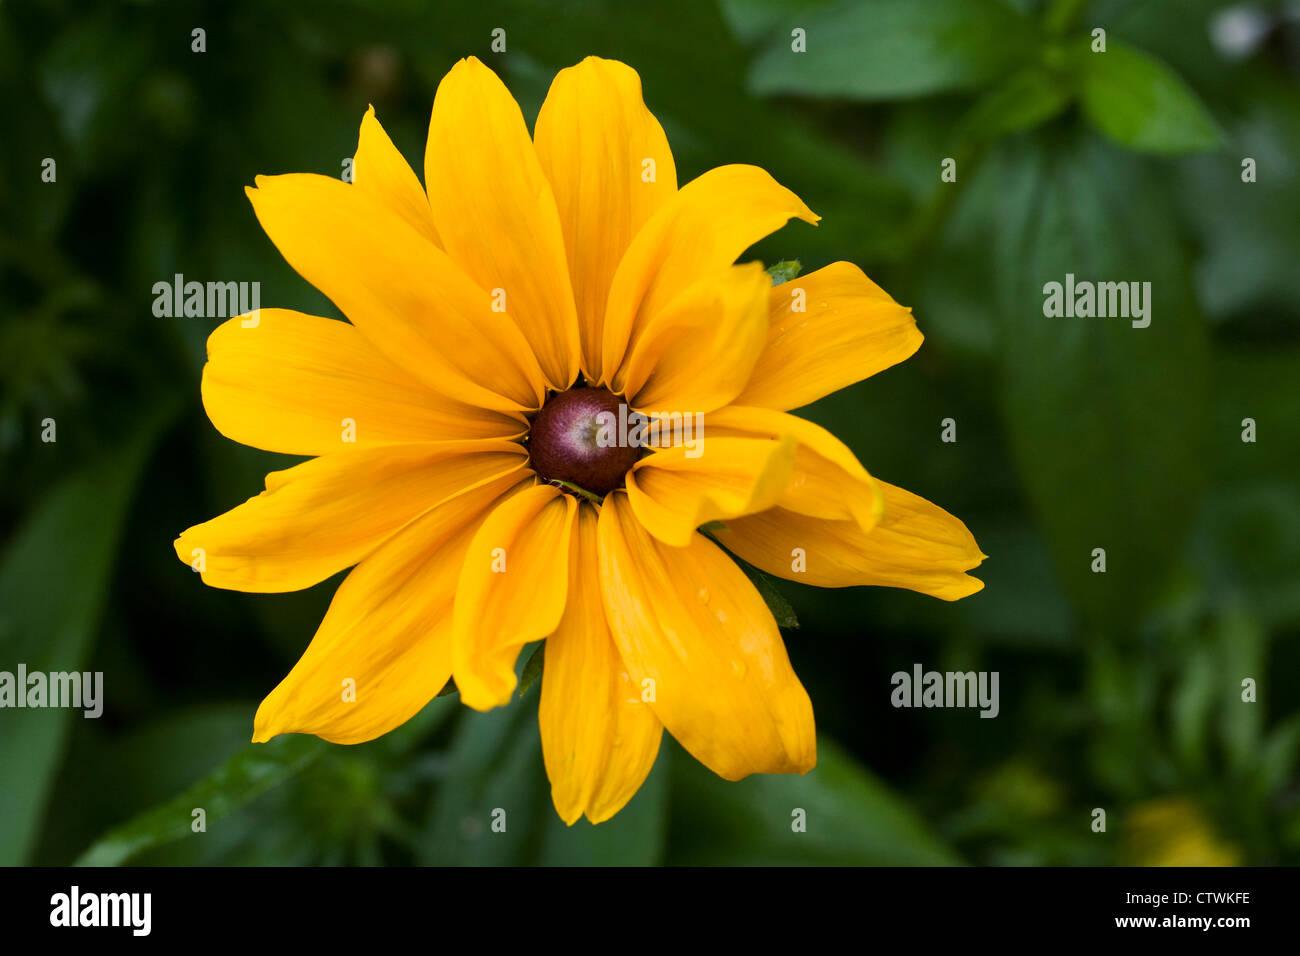 Rudbeckia hirta growing in an herbaceous border. - Stock Image